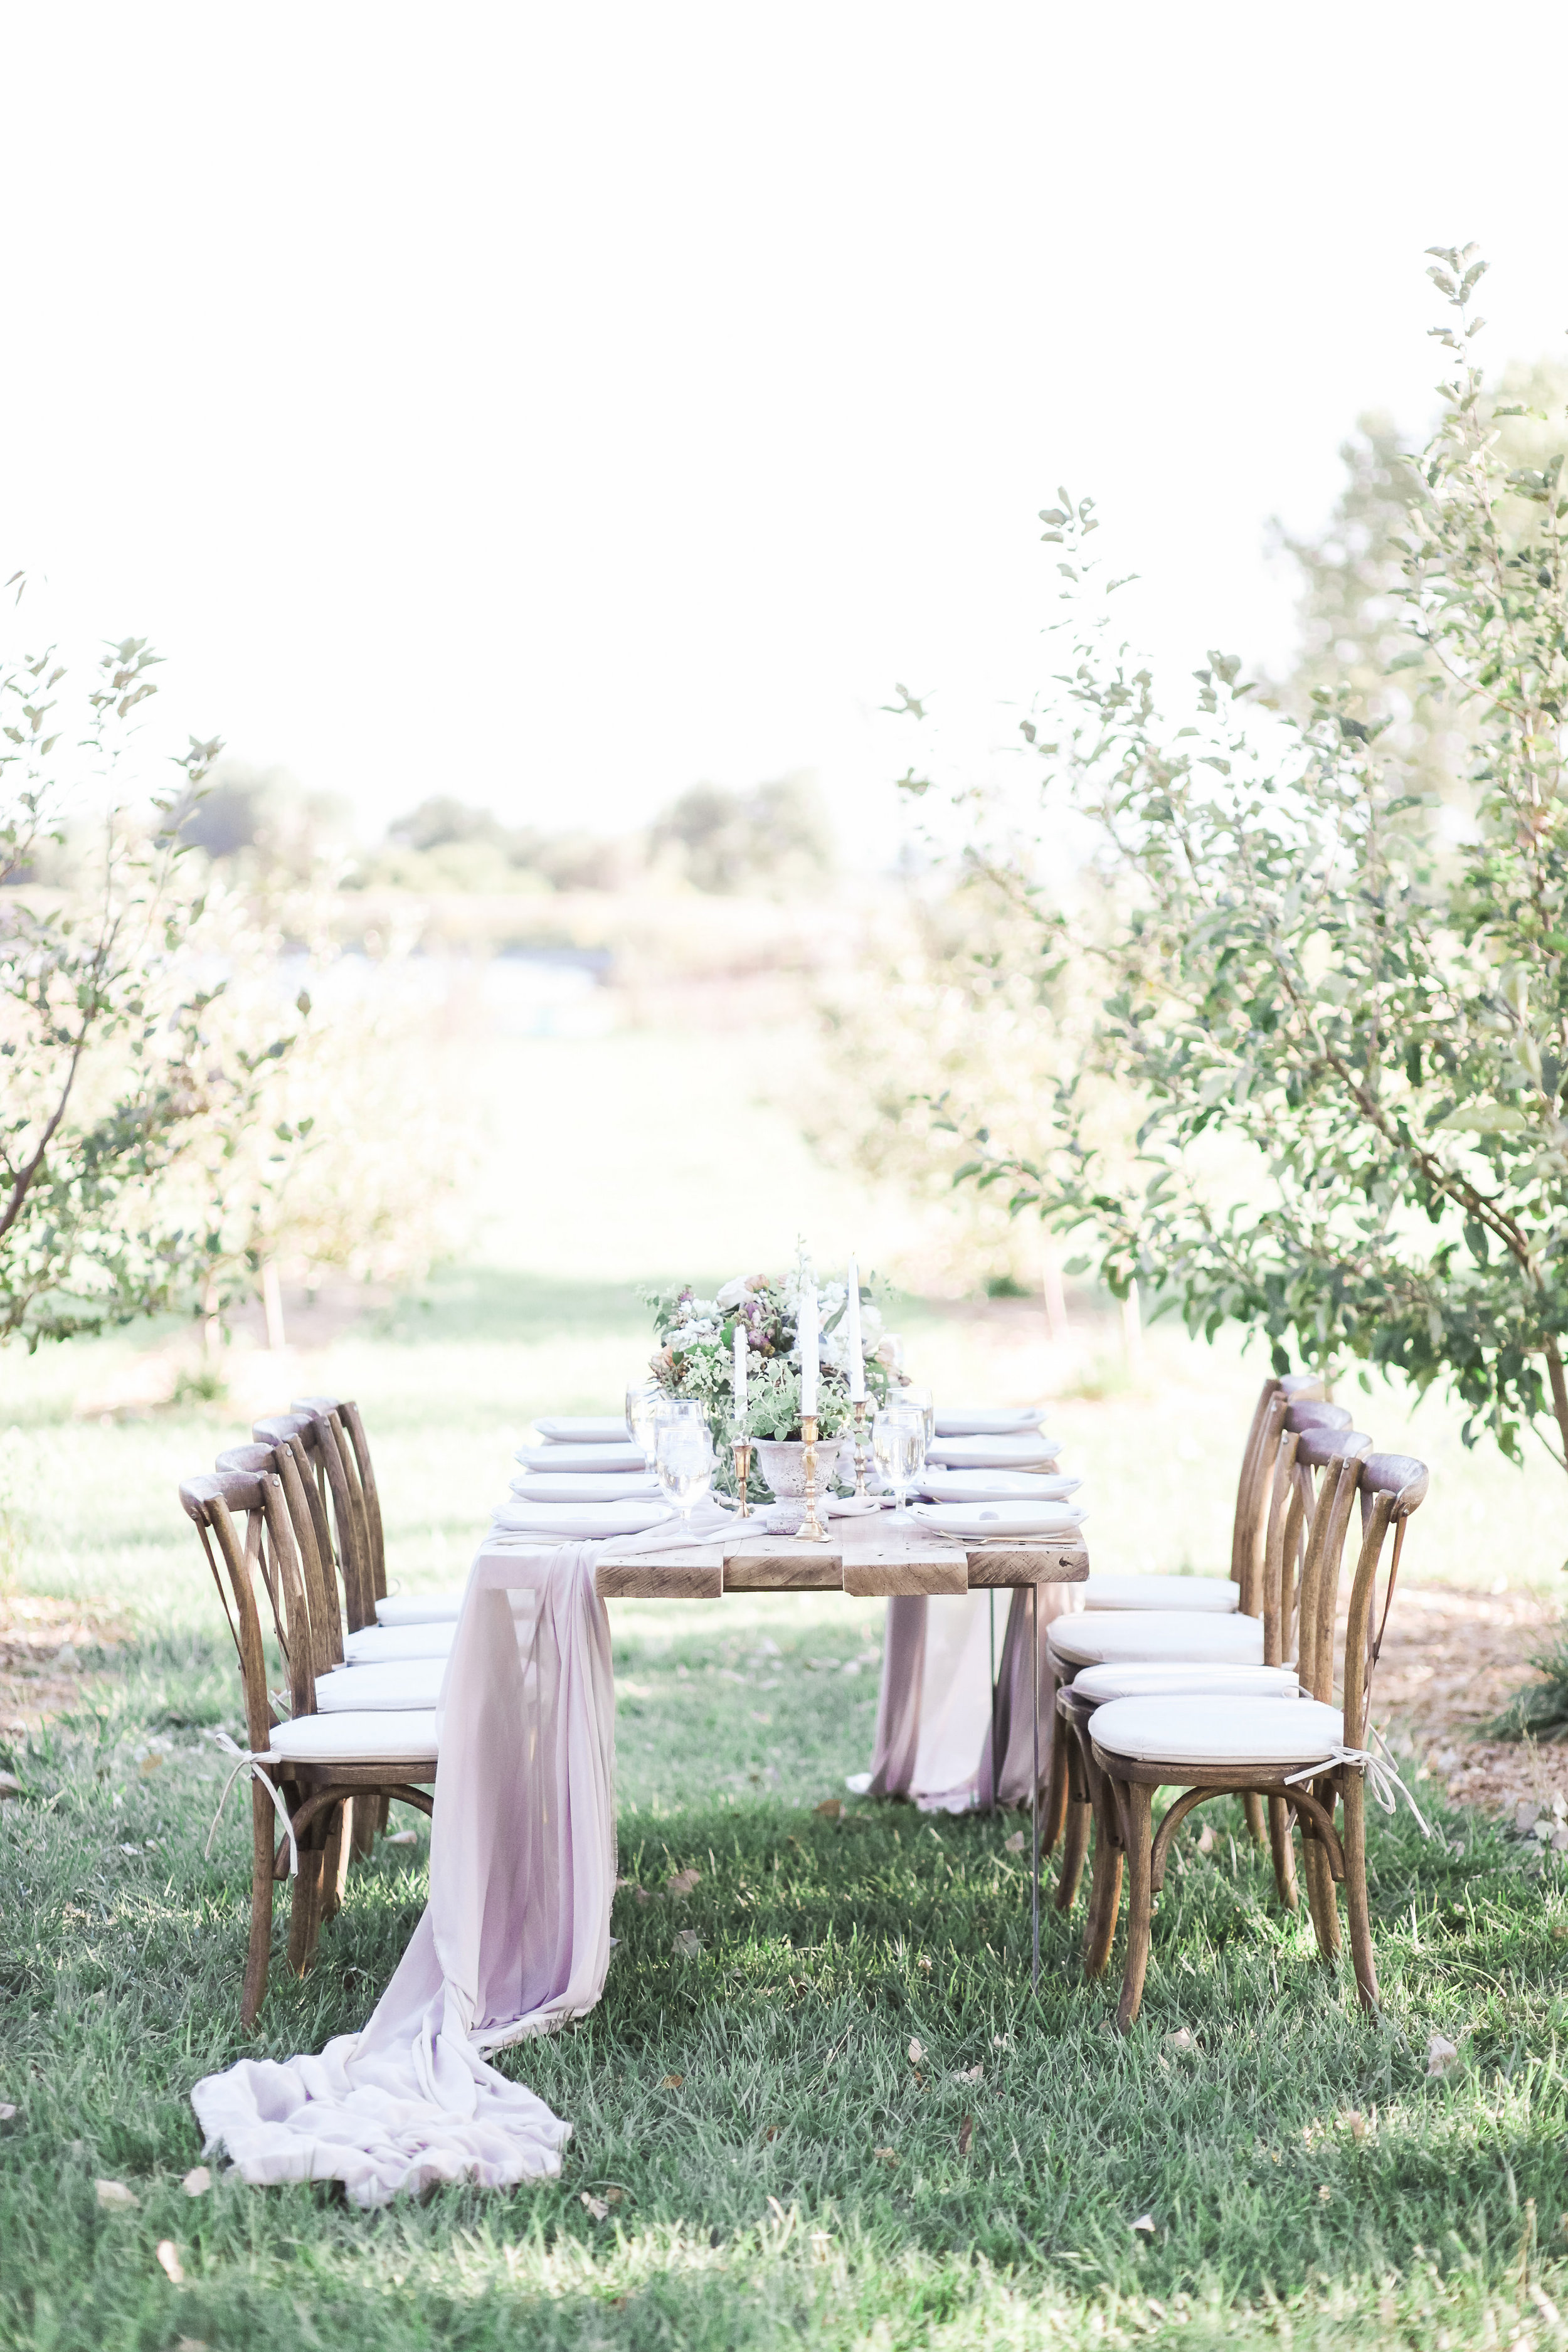 Dinner-Party-Ideas-Apple-Orchard-Rehearsal-Charcuterie-Board318.jpg